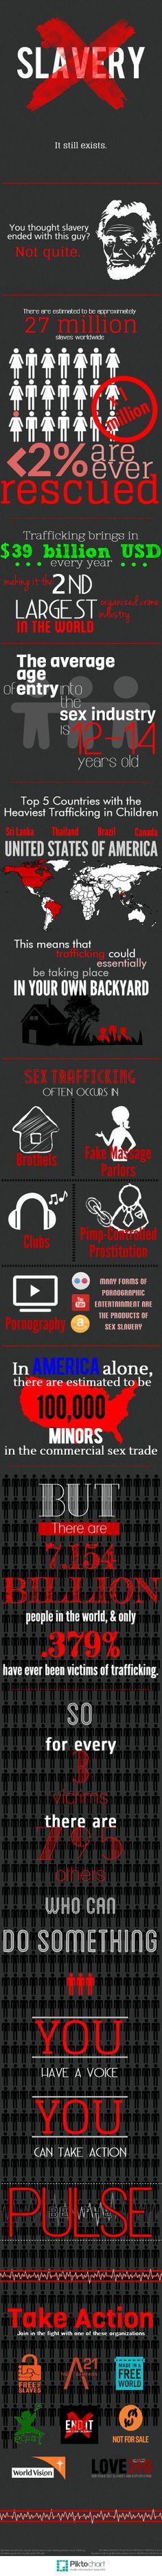 modern slavery infographic slavery infographics other modern slavery infographic slavery infographics other infographic and modern